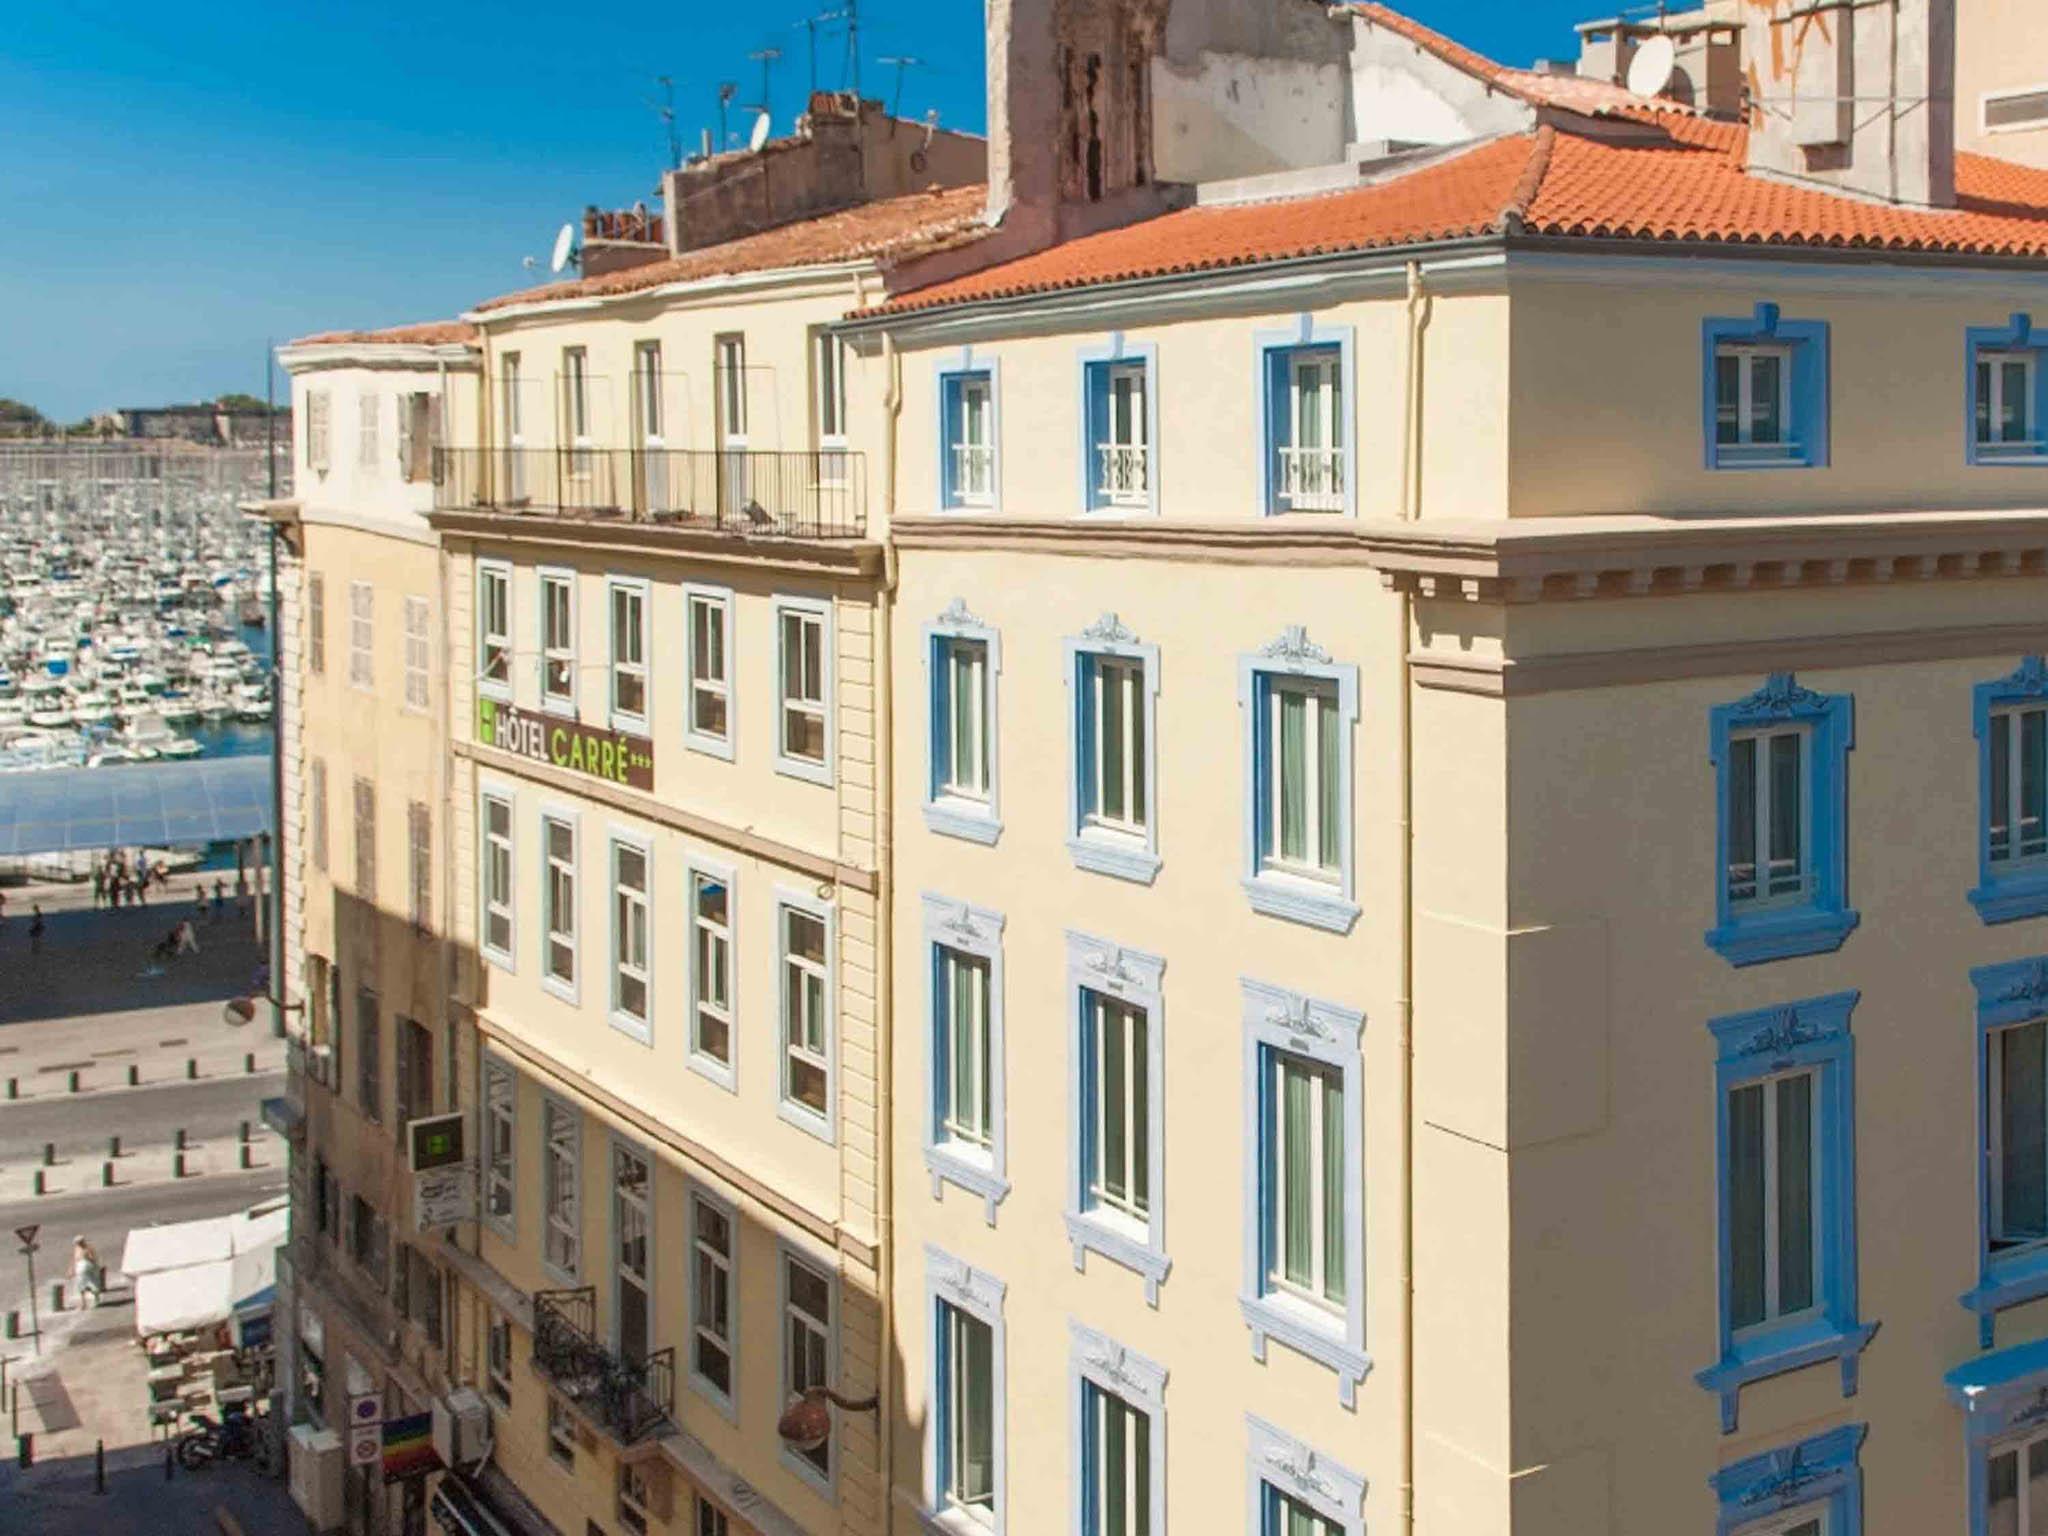 h 244 tel 224 marseille hotel carre vieux port marseille